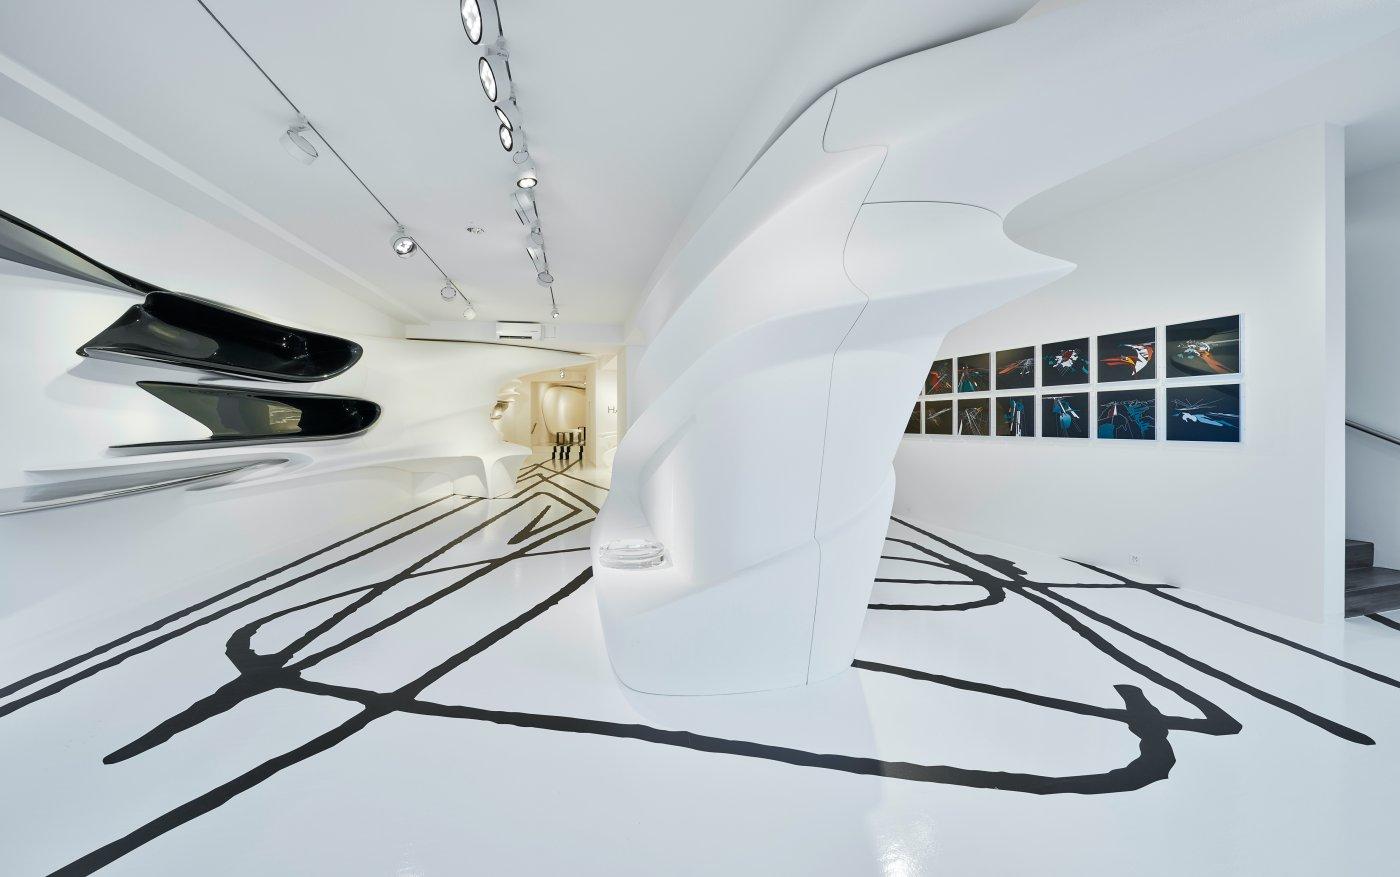 Galerie Gmurzynska Paradeplatz Zaha Hadid 2